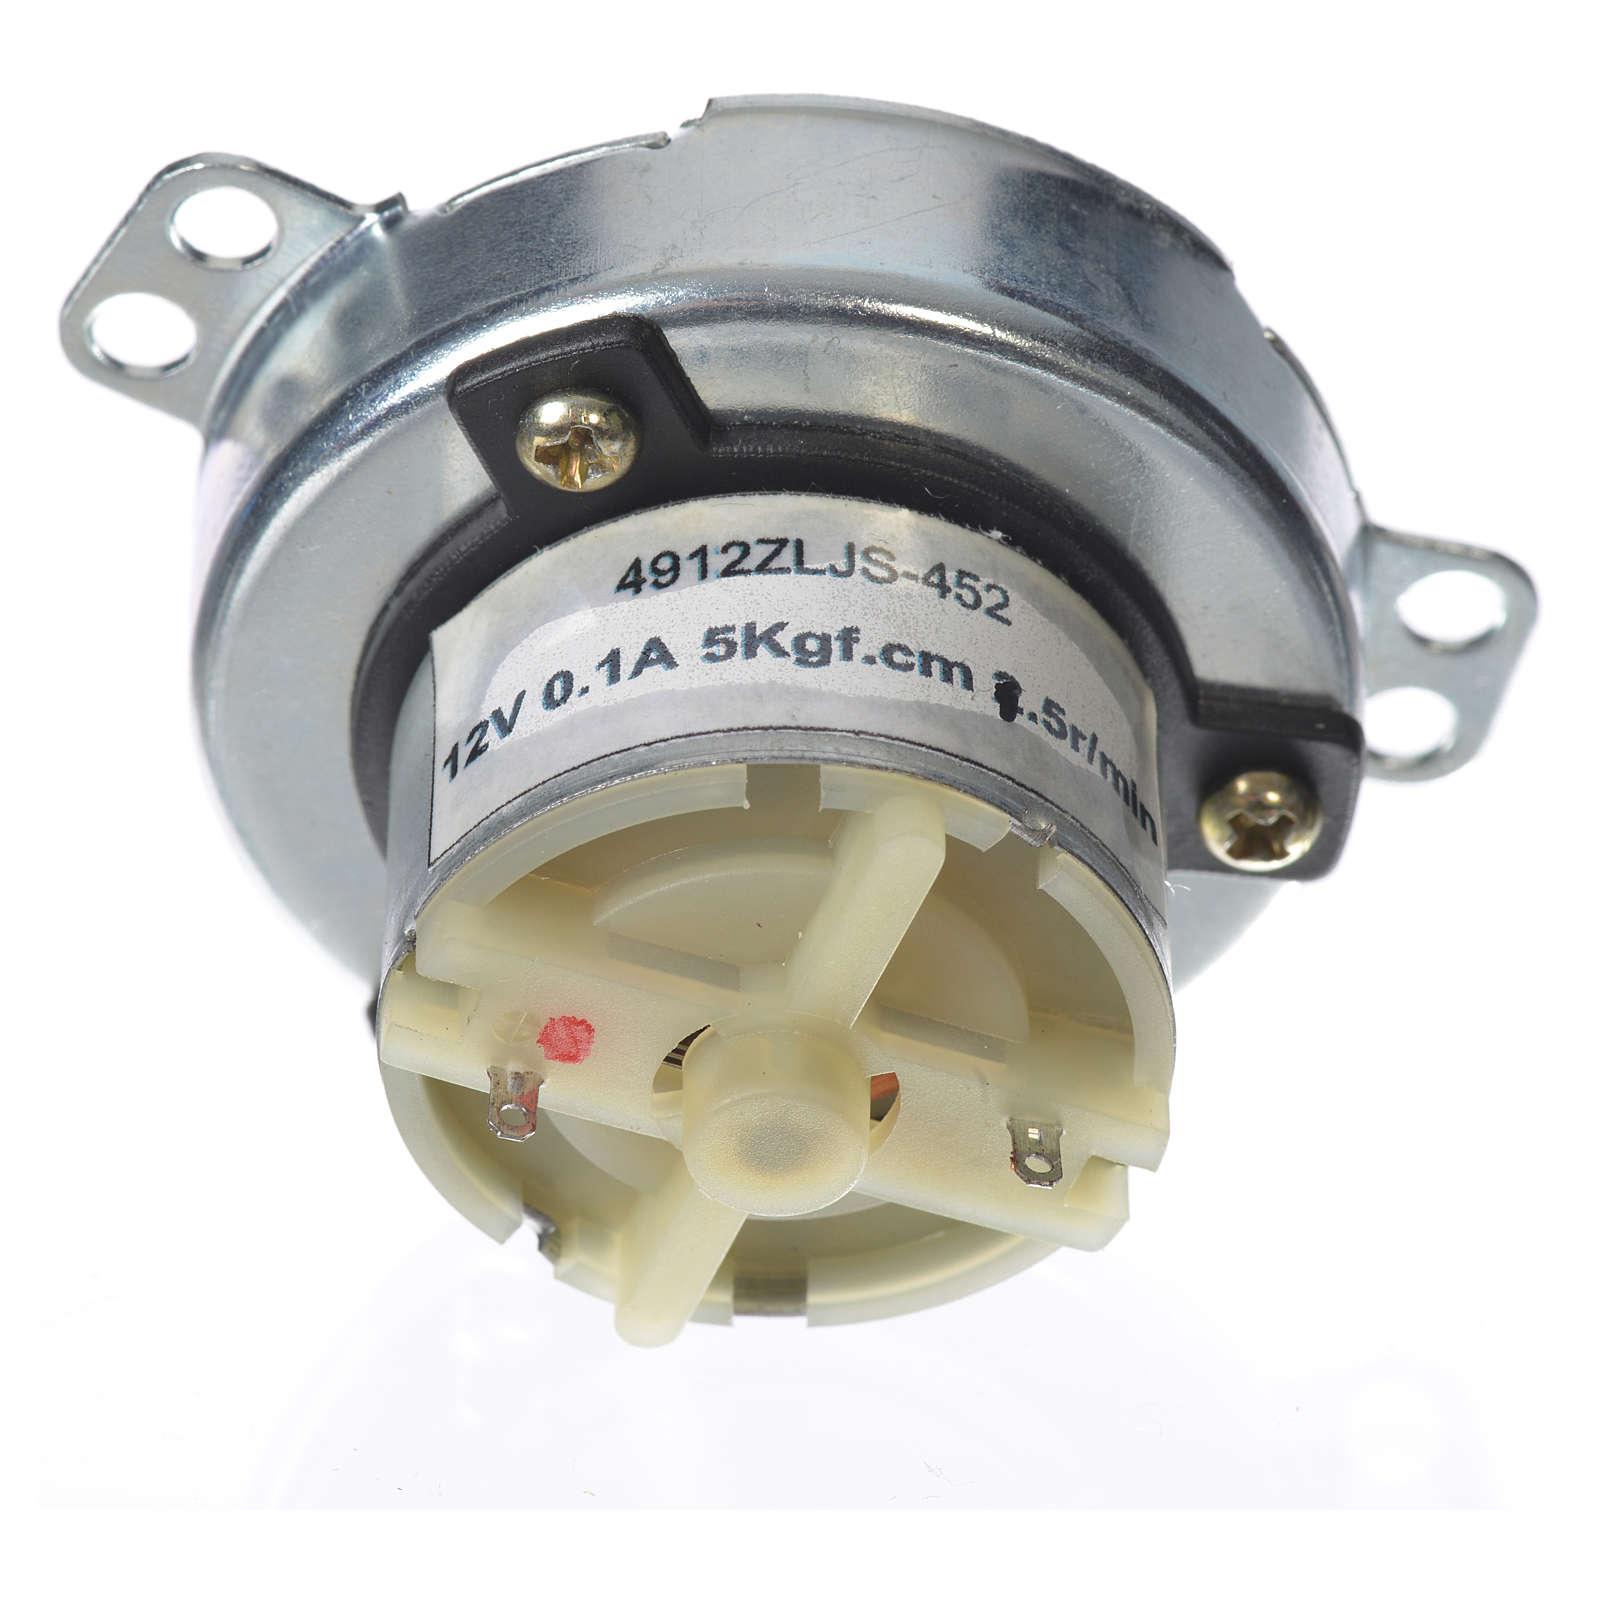 Motoriduttore MECC presepe 5 giri/min 4